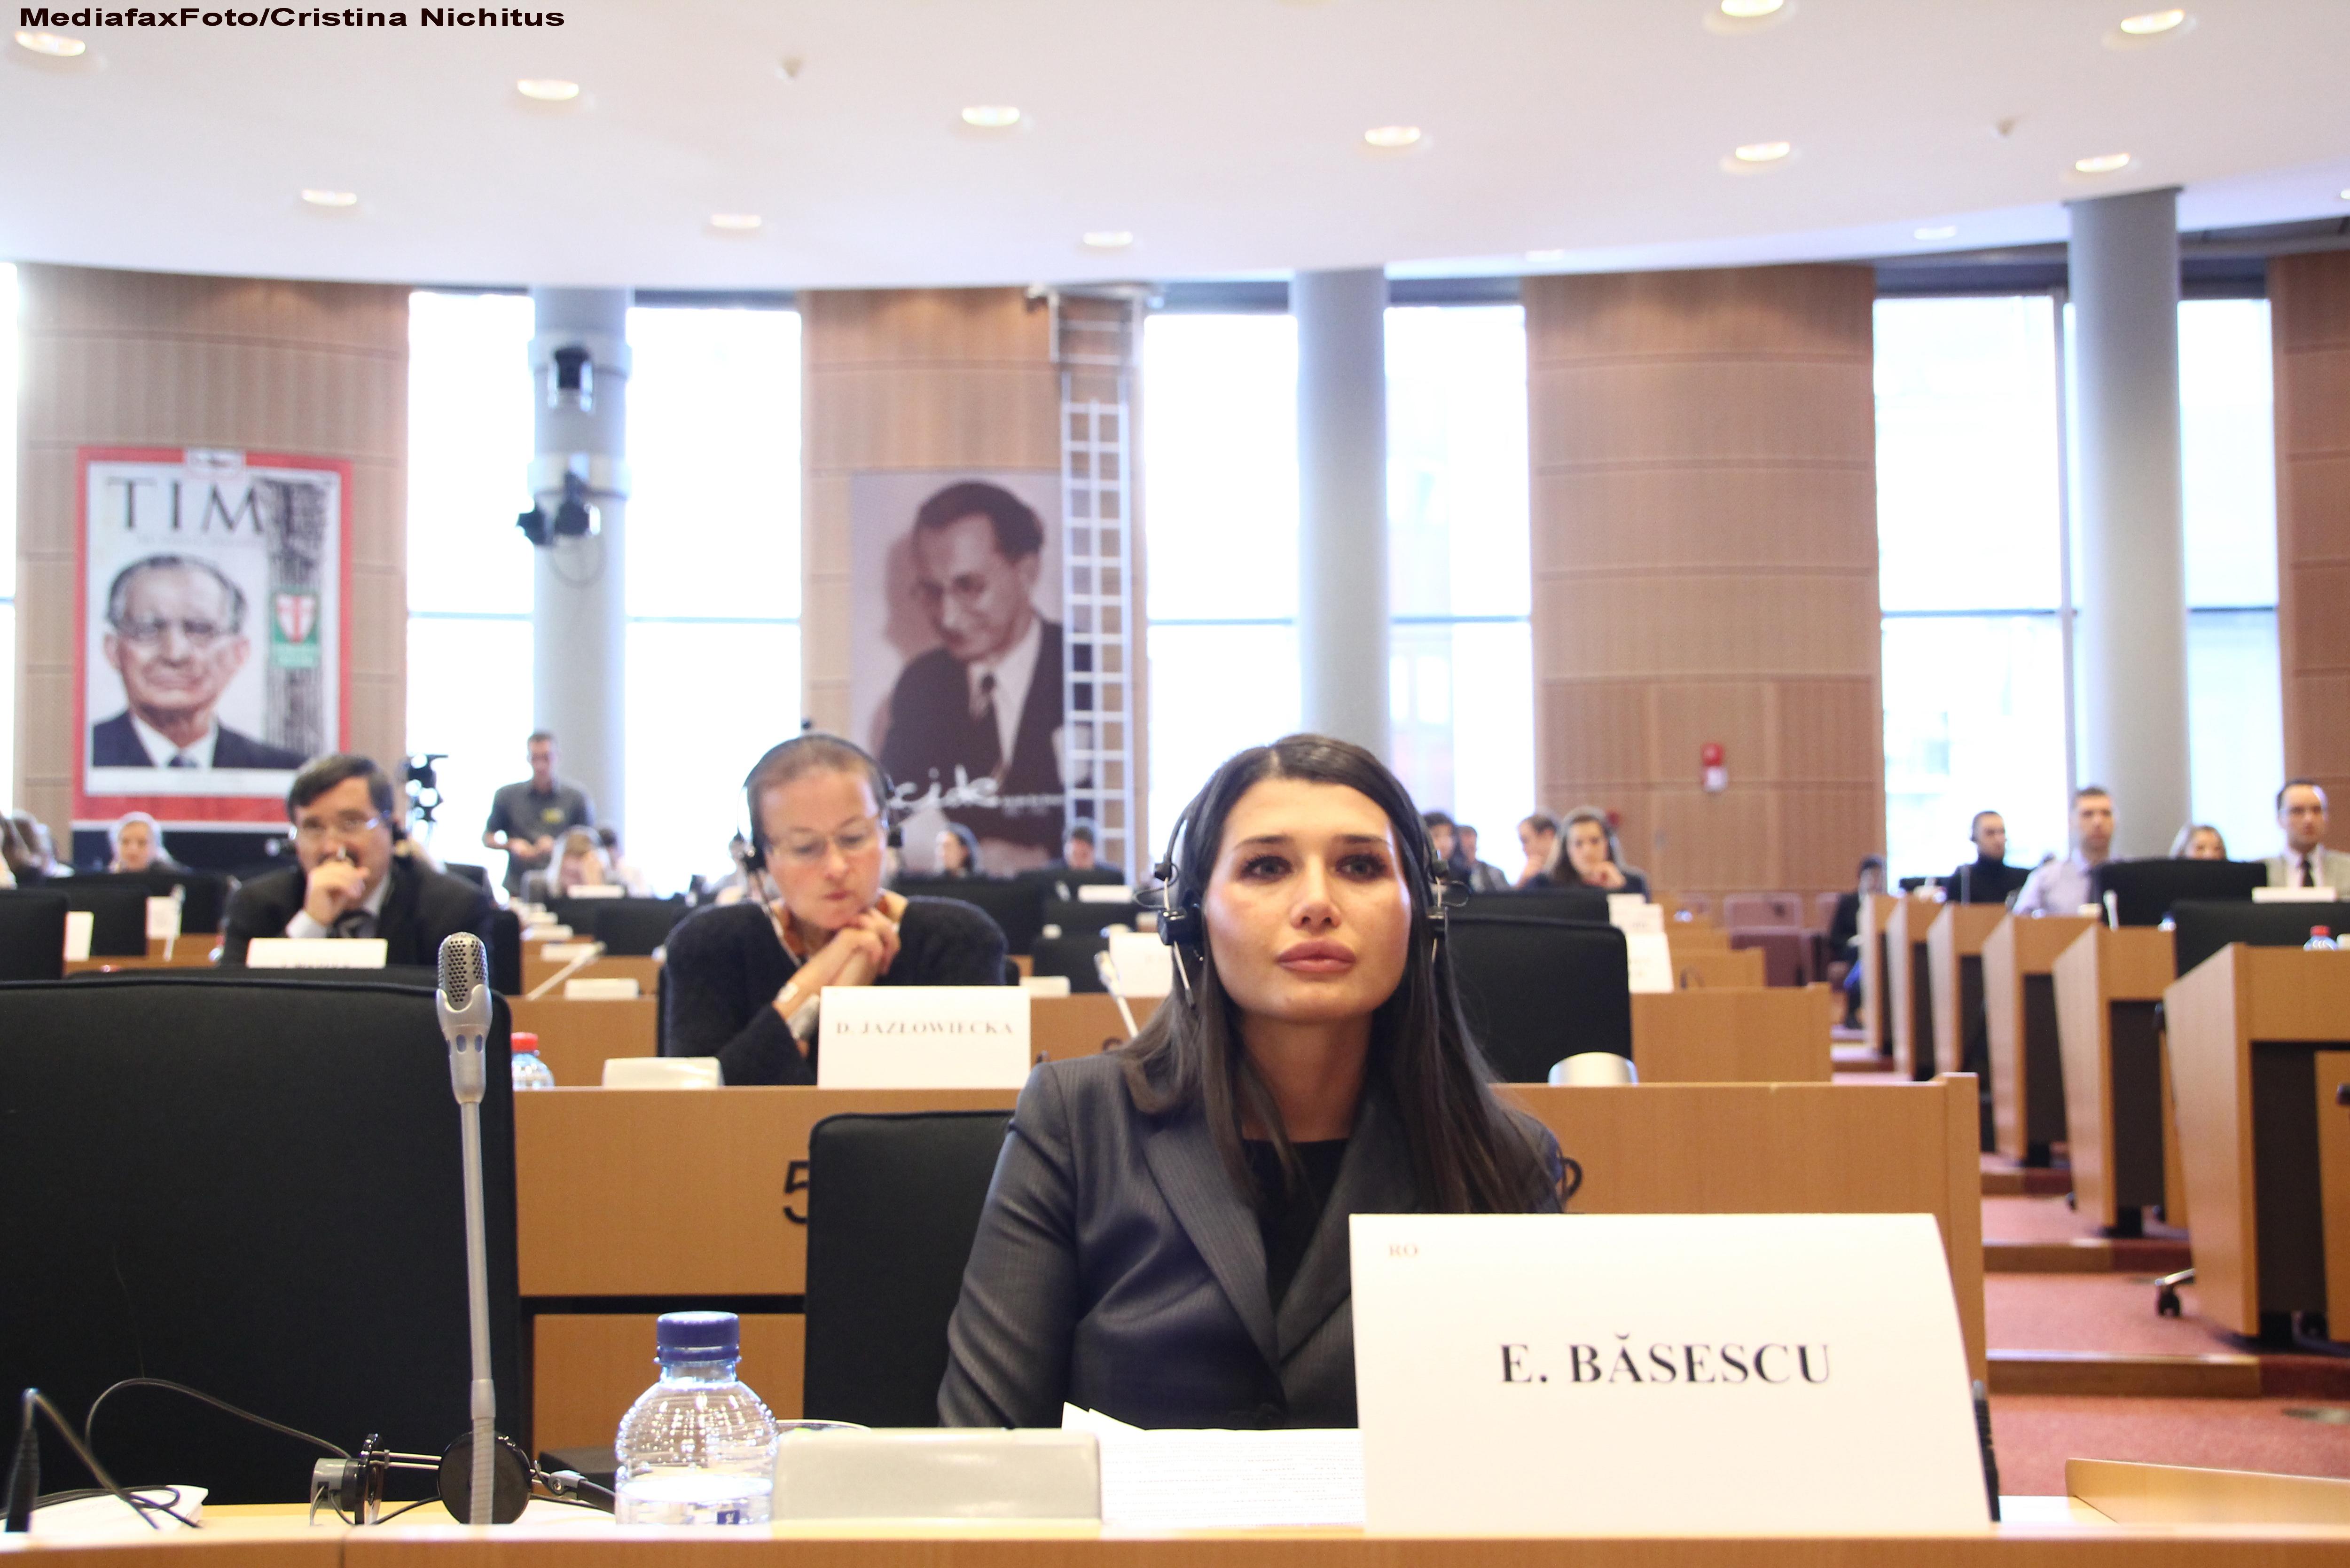 Elena Basescu s-a plimbat prin Parlamentul European cu un tricou cu poza lui Timosenko: